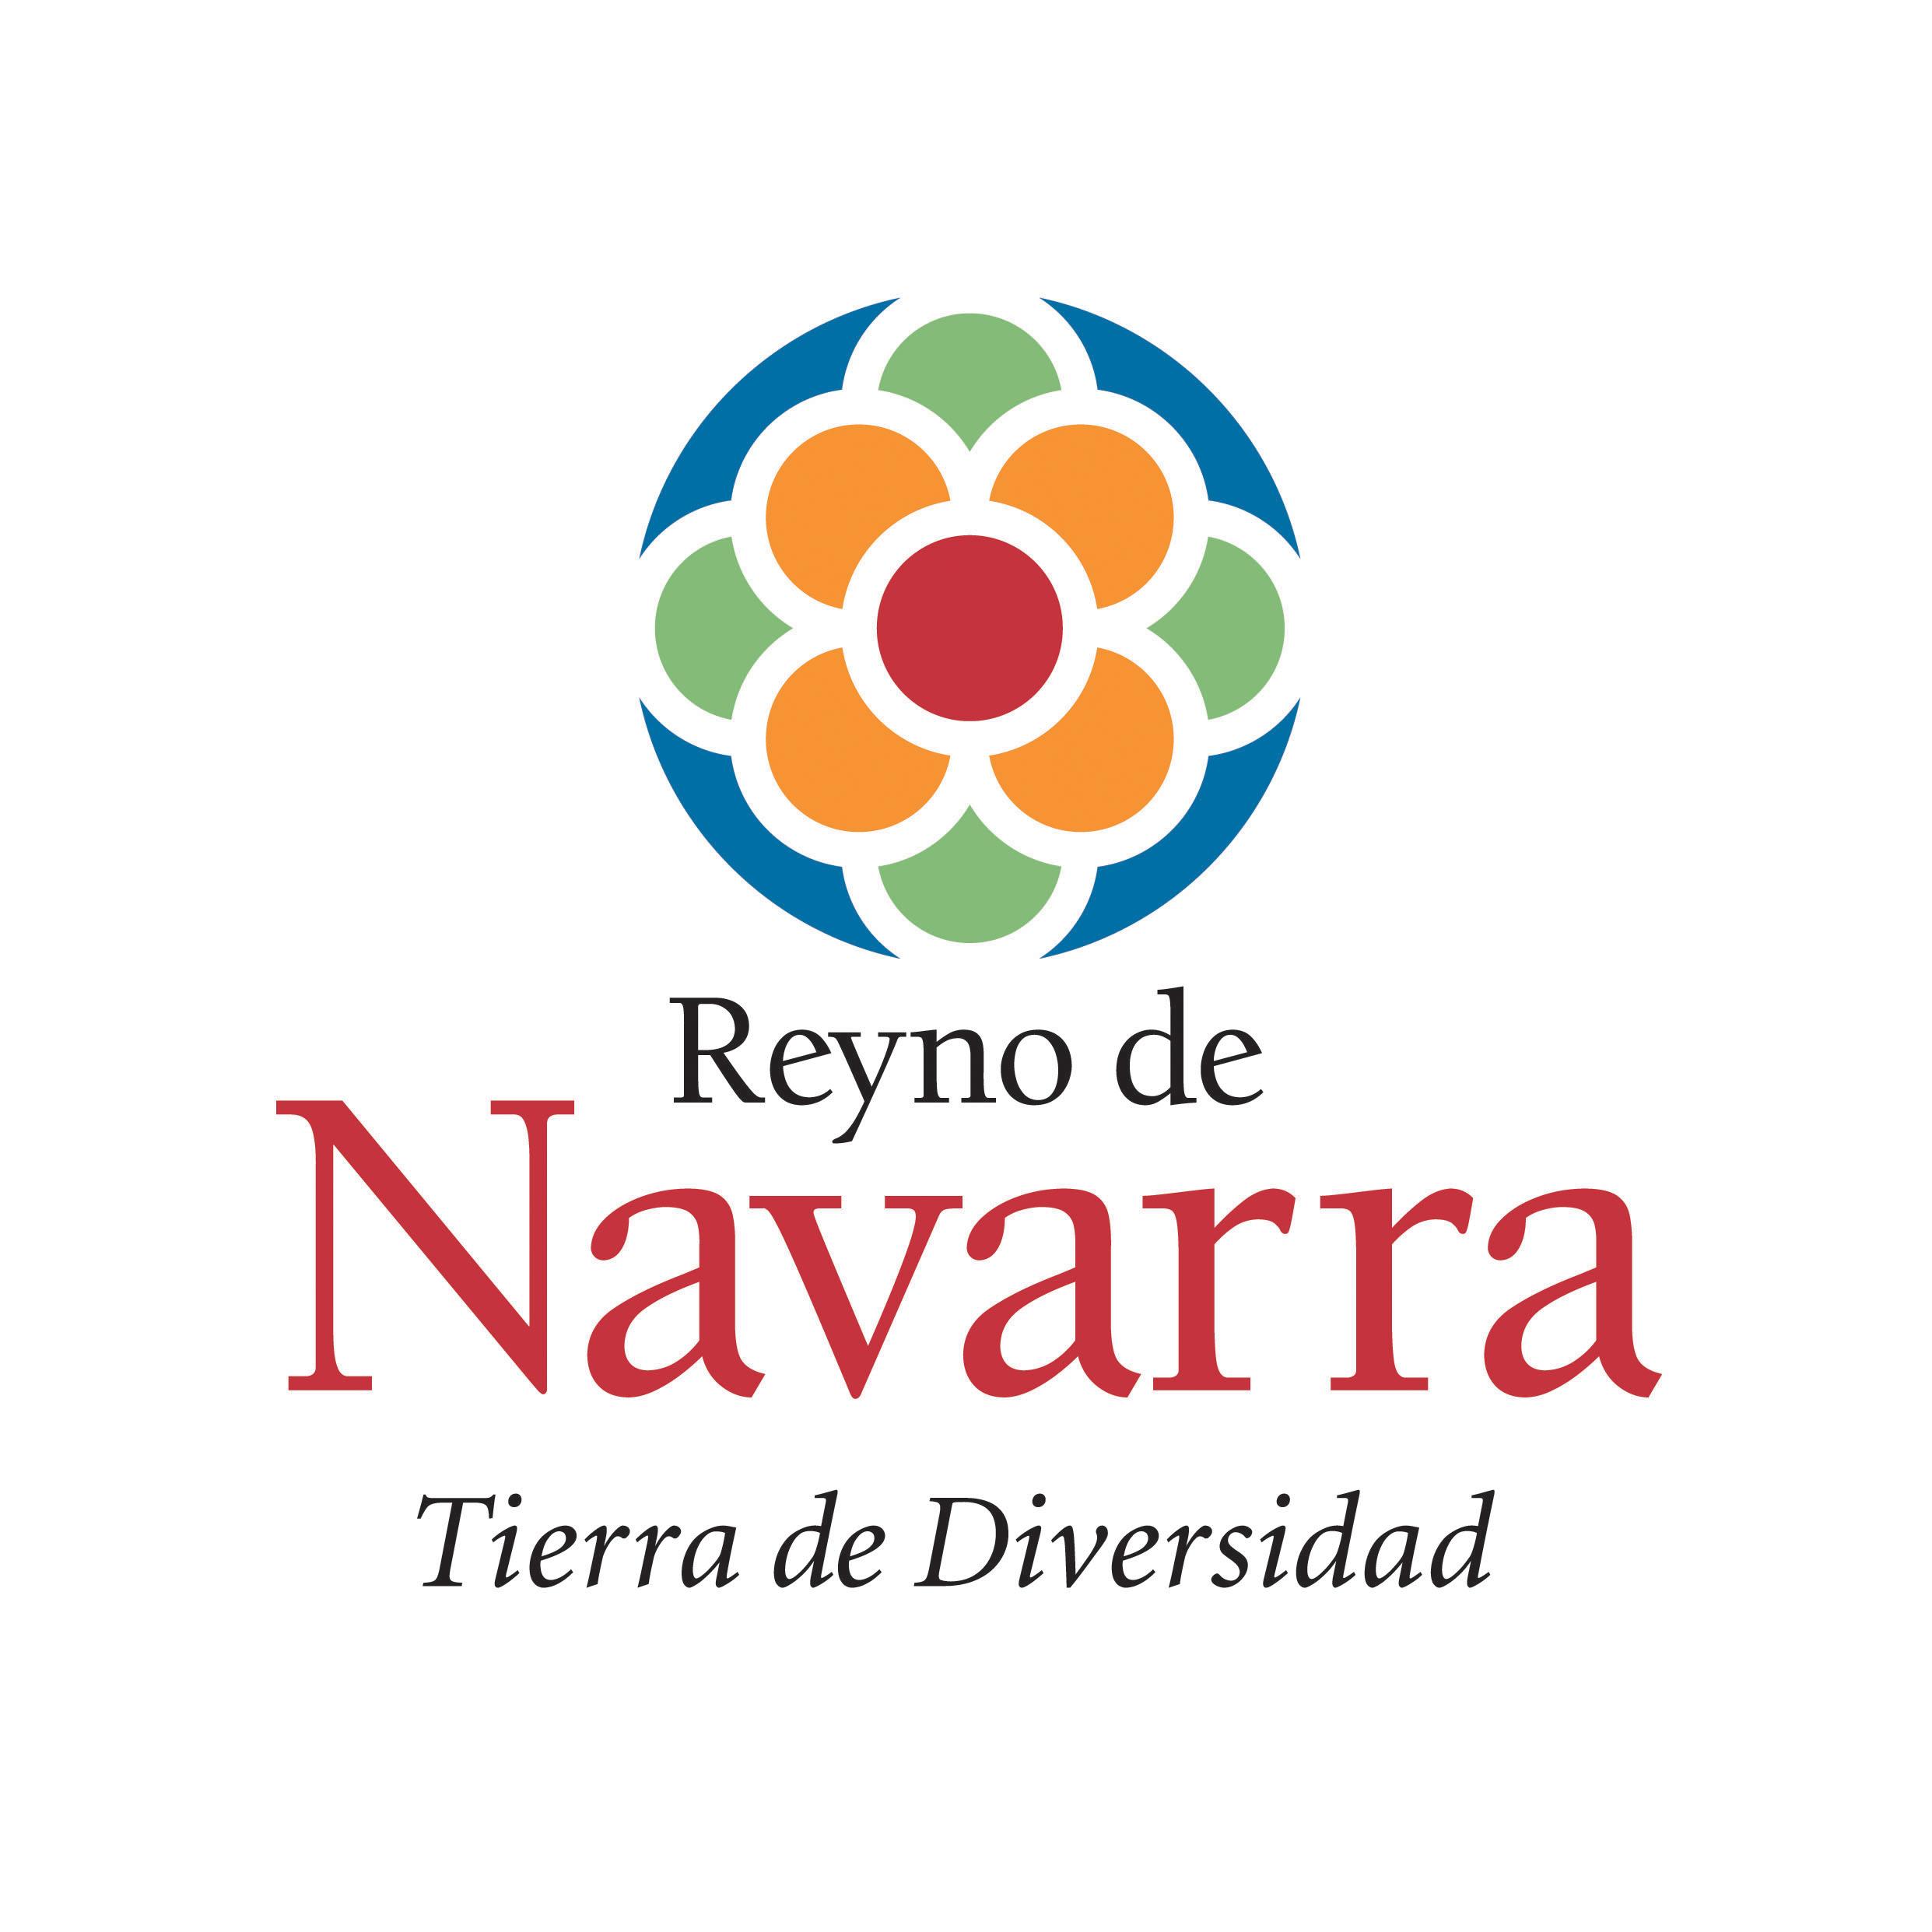 http://www.navarra.es/NR/rdonlyres/8916E577-87A8-4BA8-AF54-6BB0DDA0FE23/65850/LogoCASTELLANOverticalcolor.jpg